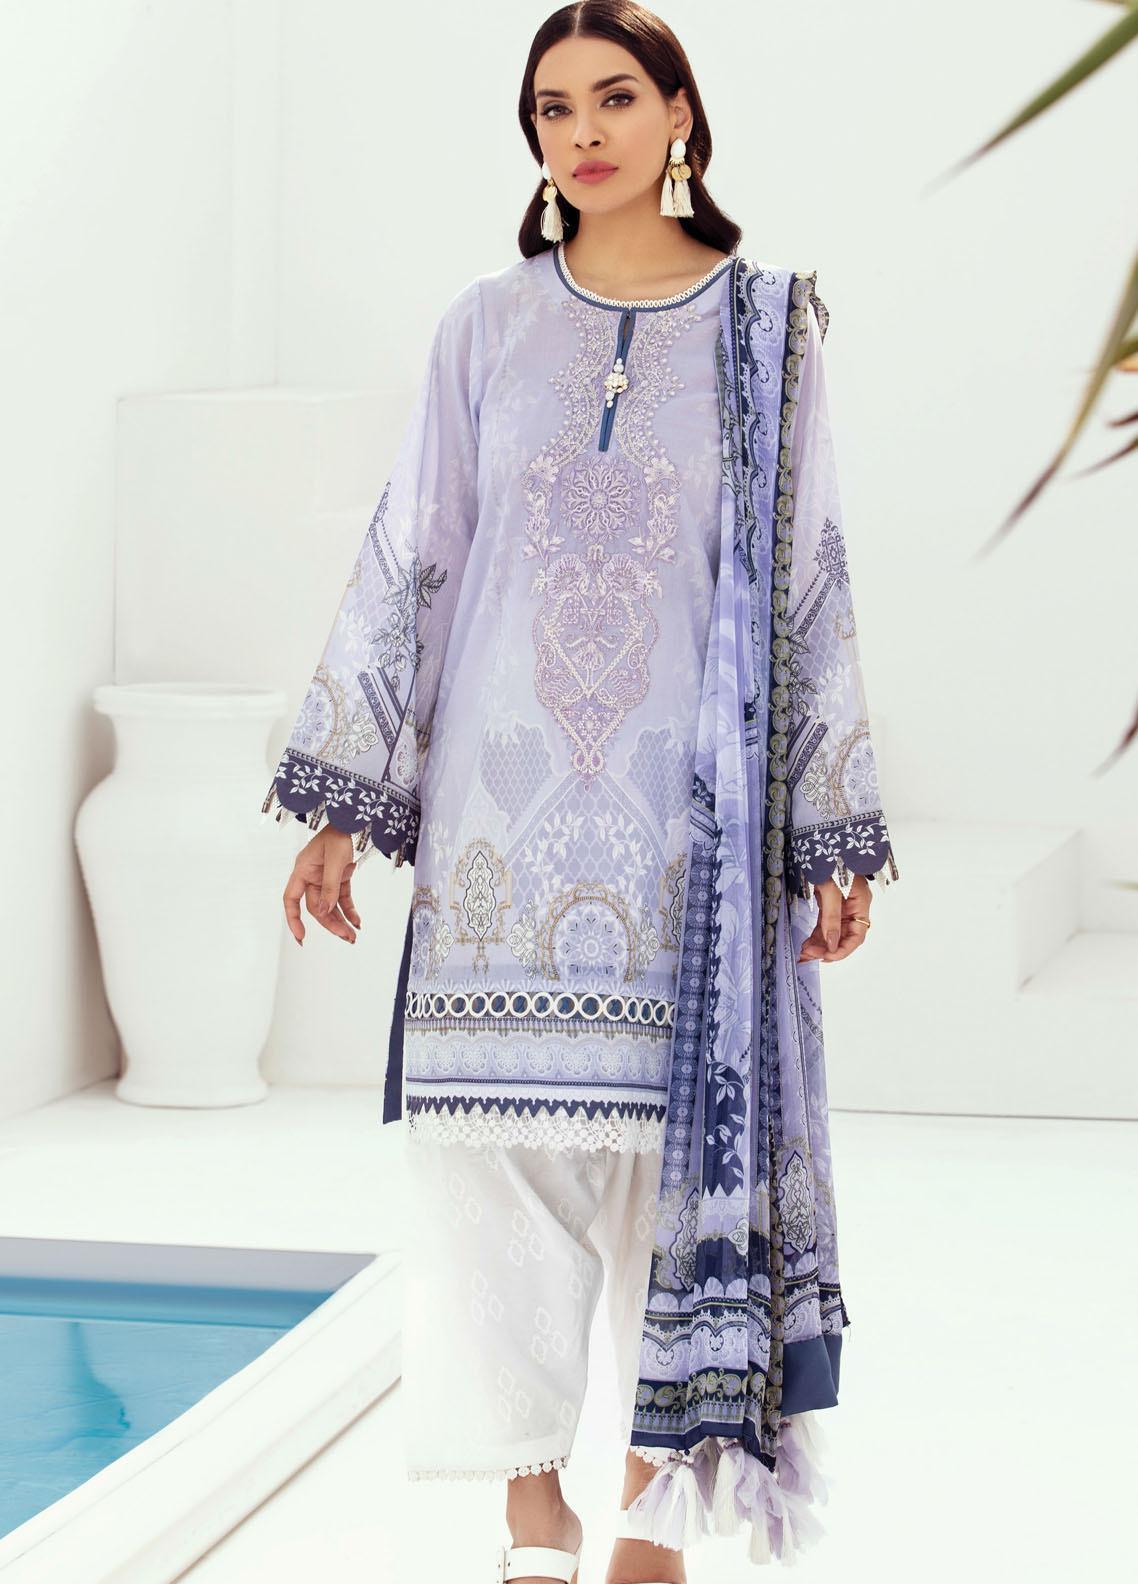 Farasha Embroidered Lawn Suits Unstitched 3 Piece FSH21L 04-LAVENDER DEW - Summer Collection